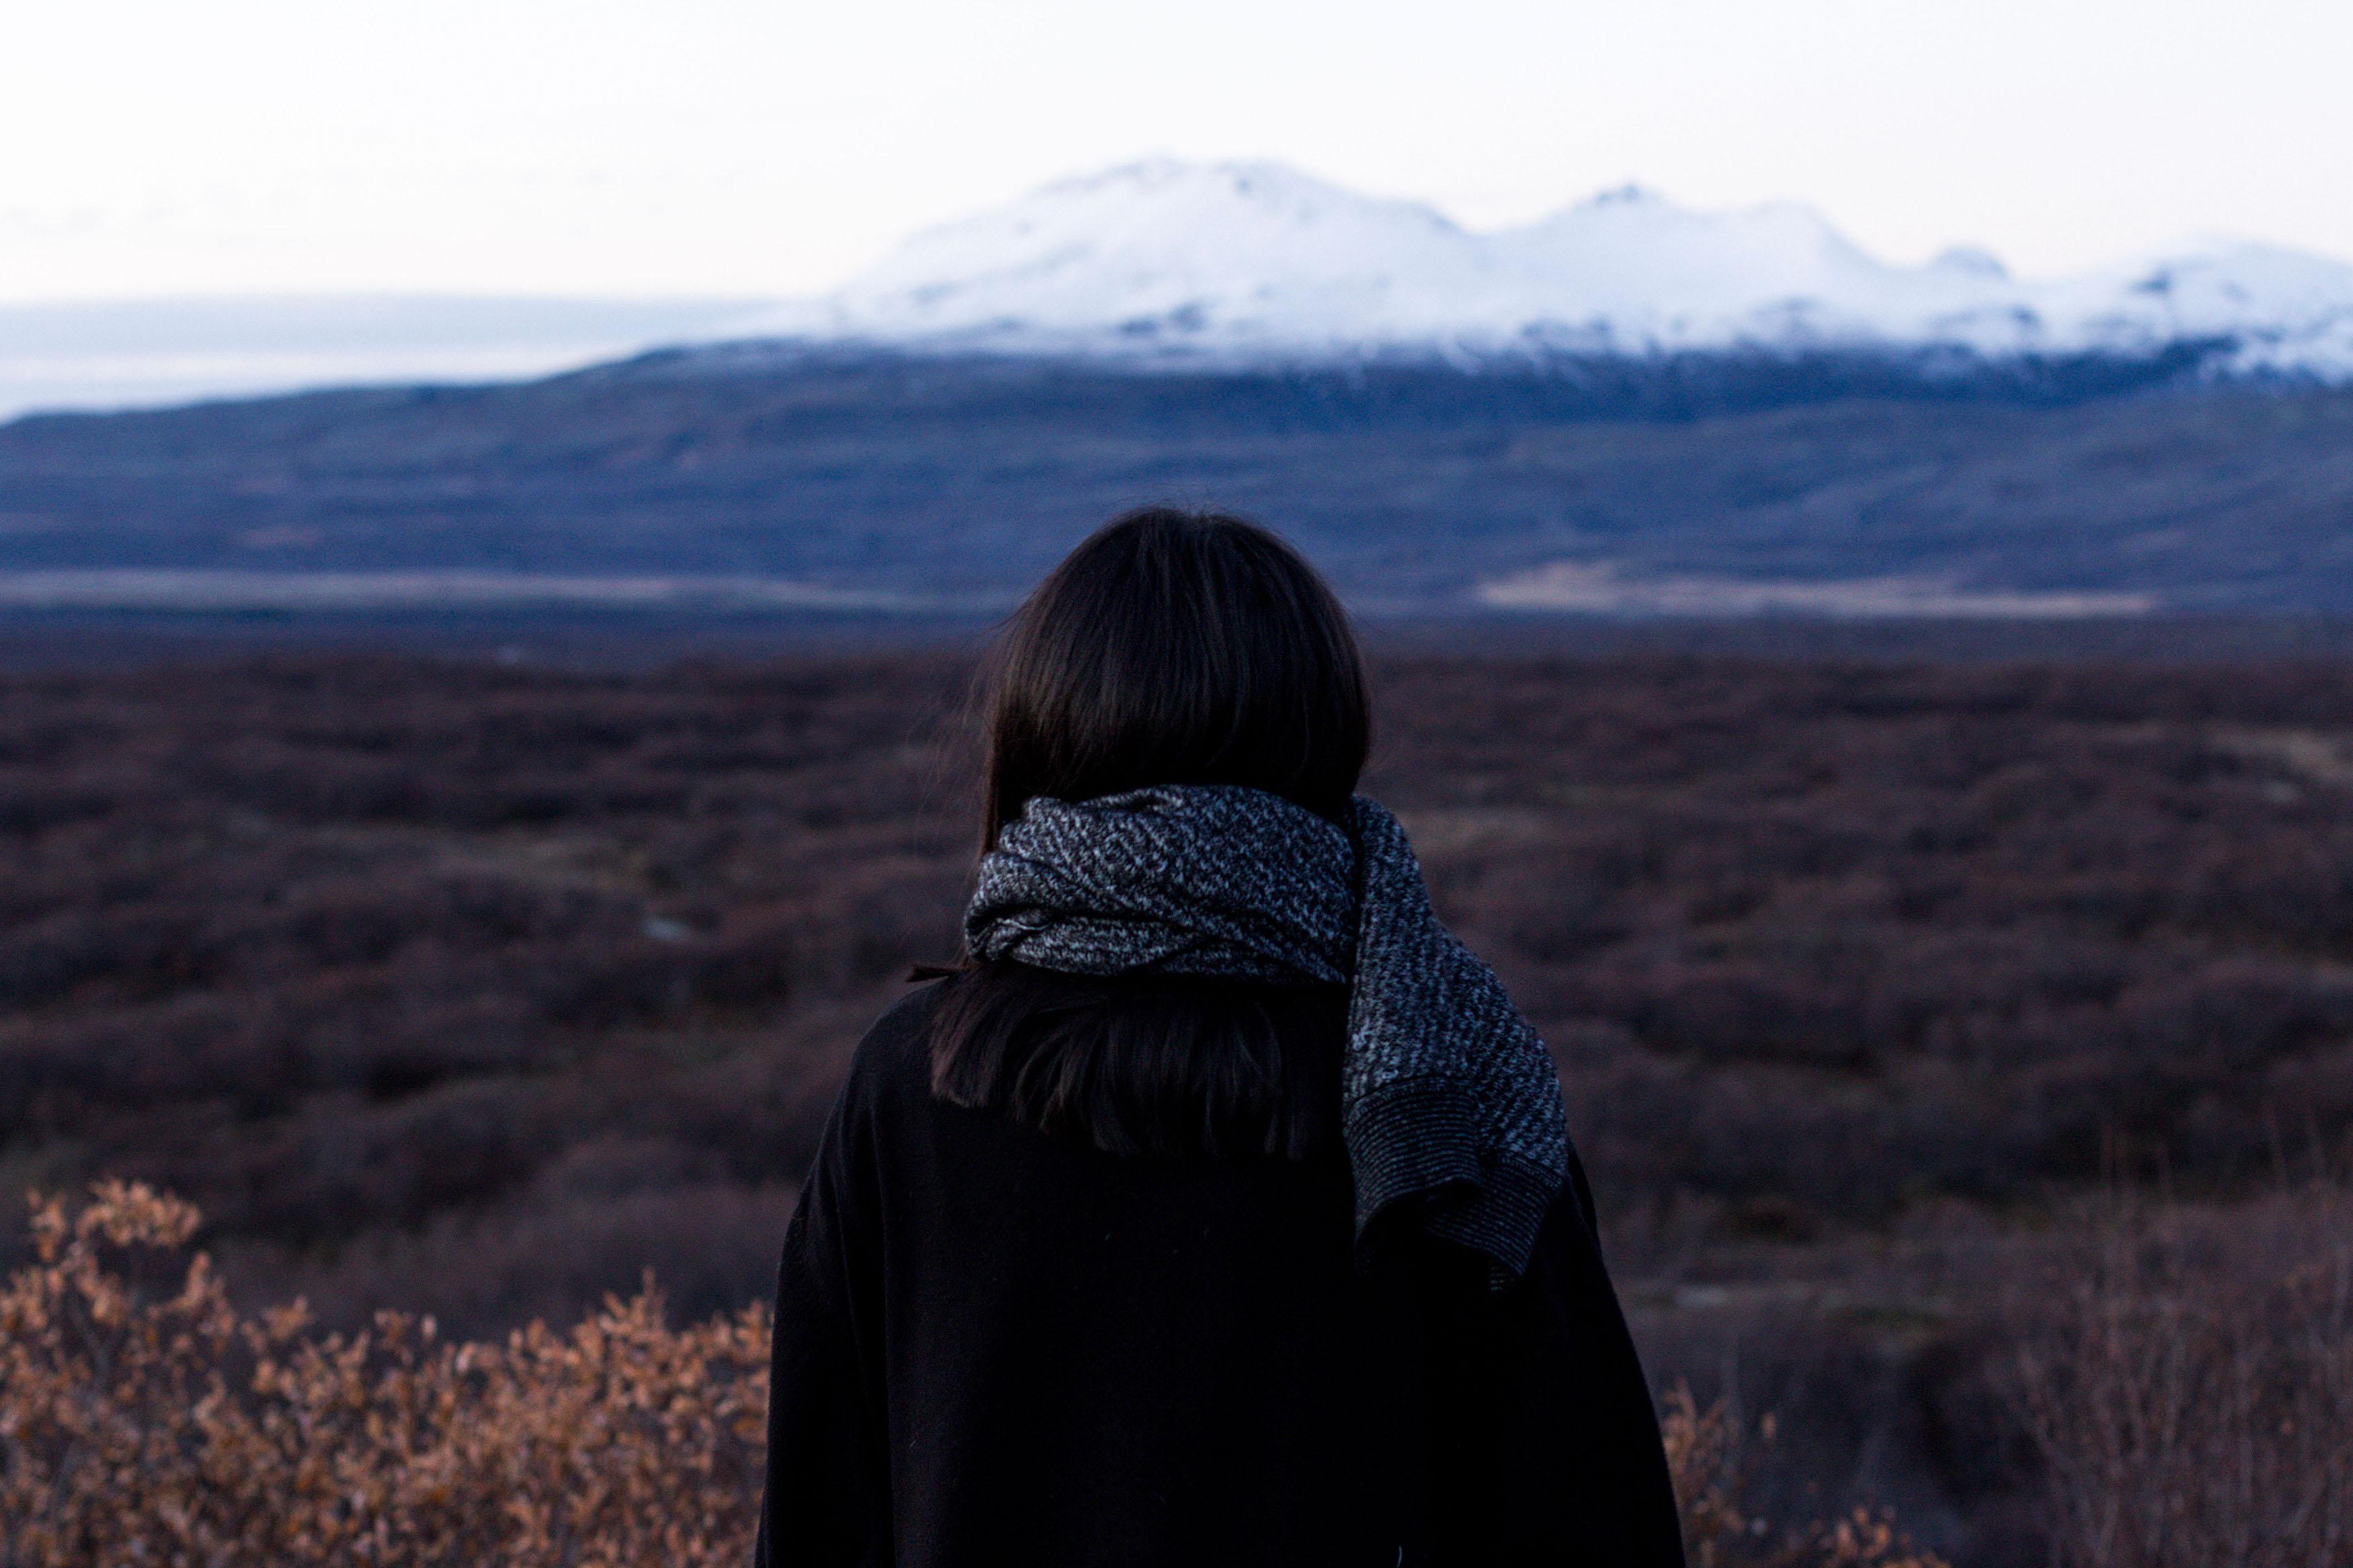 IHEARTALICE.DE – Fashion, Lifestyle & Travel-Diary by Alice M. Huynh from Berlin/Germany: Iceland Travel Diary / Pingvellir/Thingvellir National Park near Reykjavik